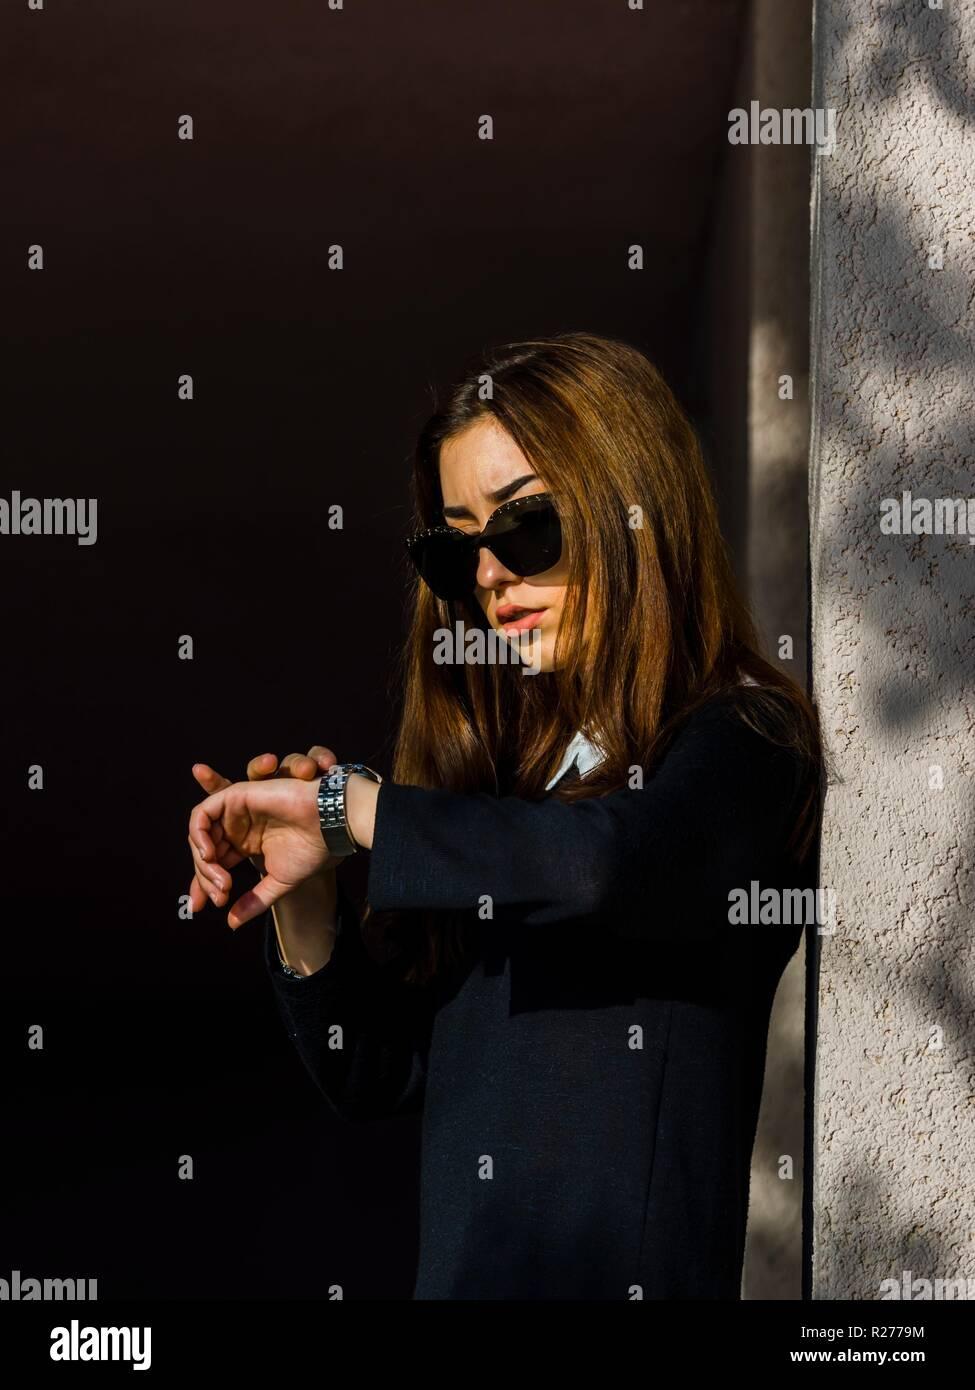 Teen girl waiting anxiously - Stock Image